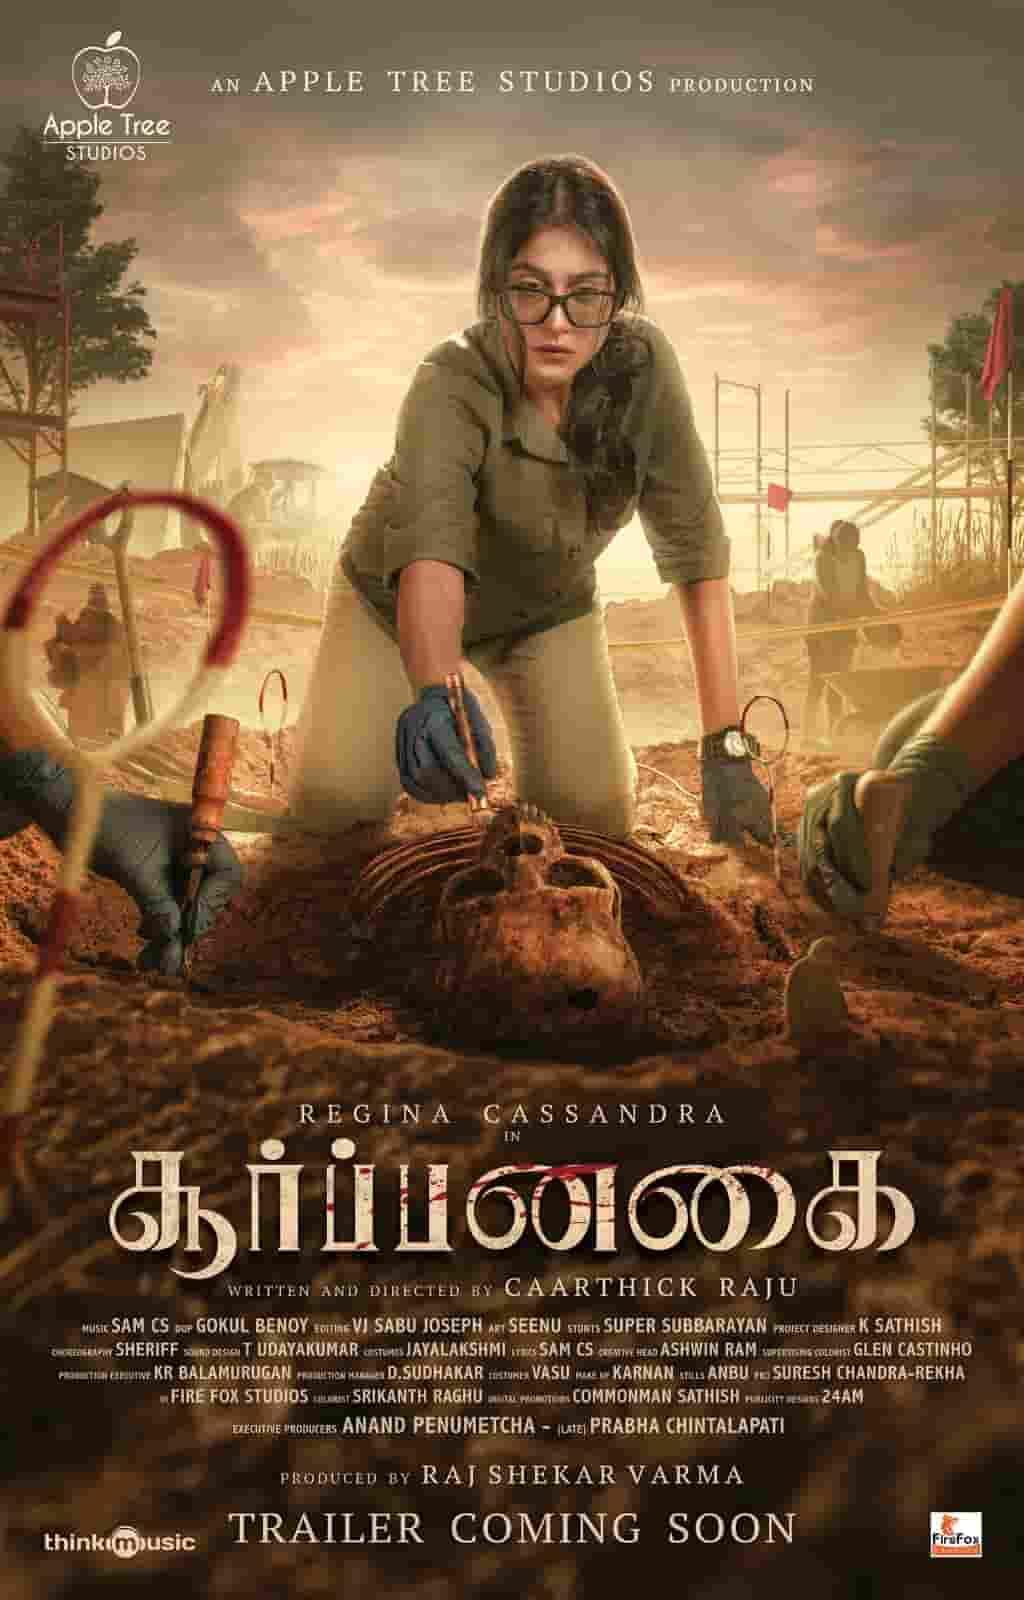 Soorpanagai Trailer coming soon shoot wrapped